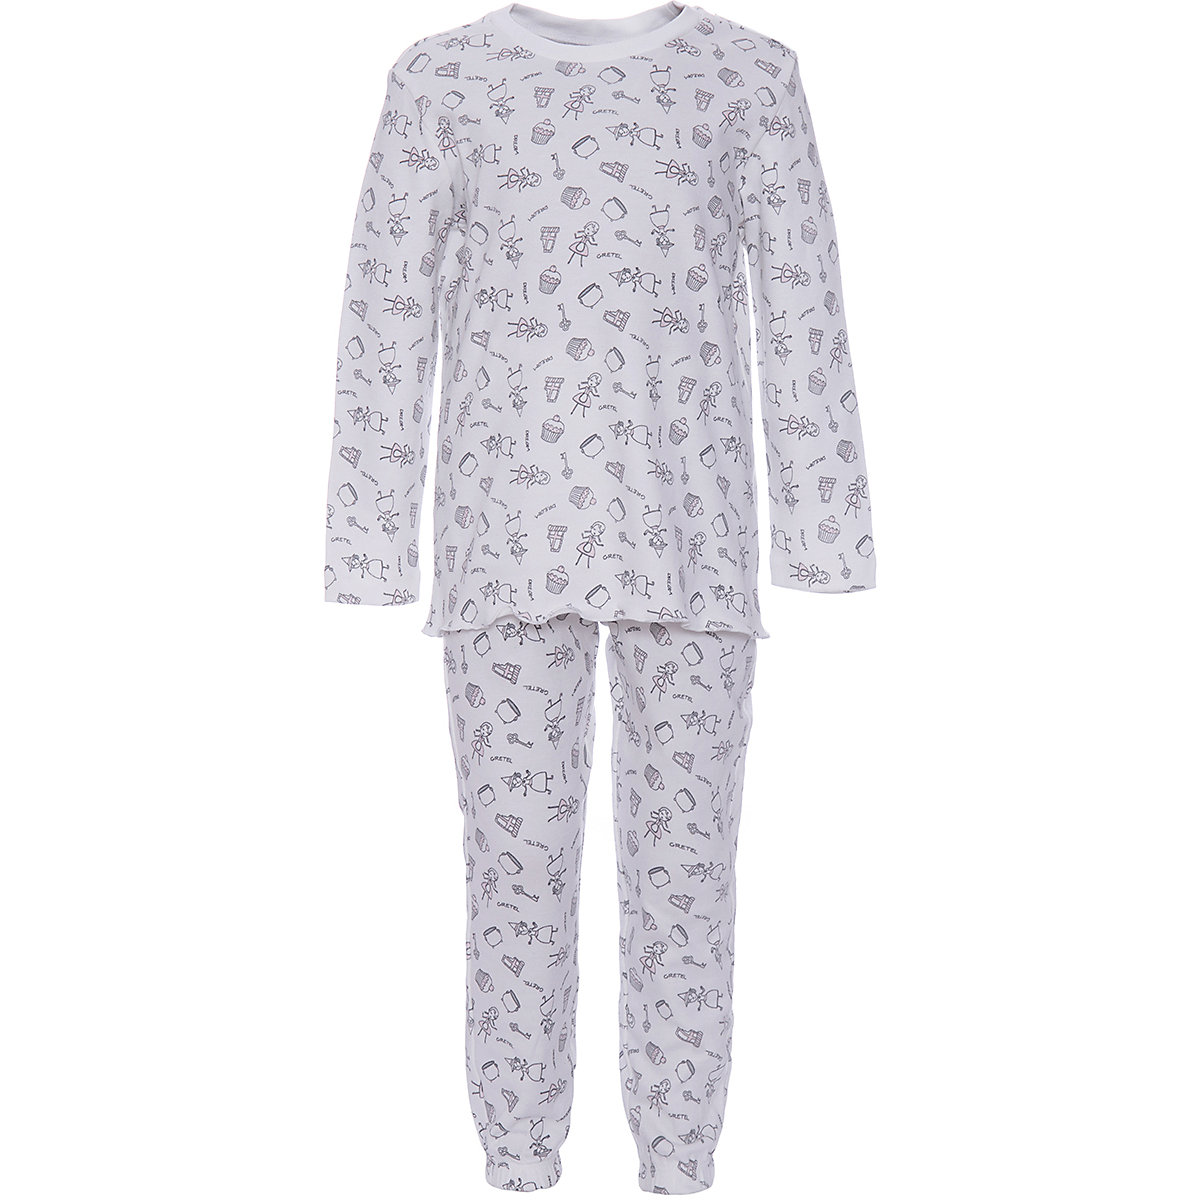 ORIGINAL MARINES Pajama Sets 9501970 Cotton Girls childrens clothing Sleepwear Robe parrot print cami pajama set with robe